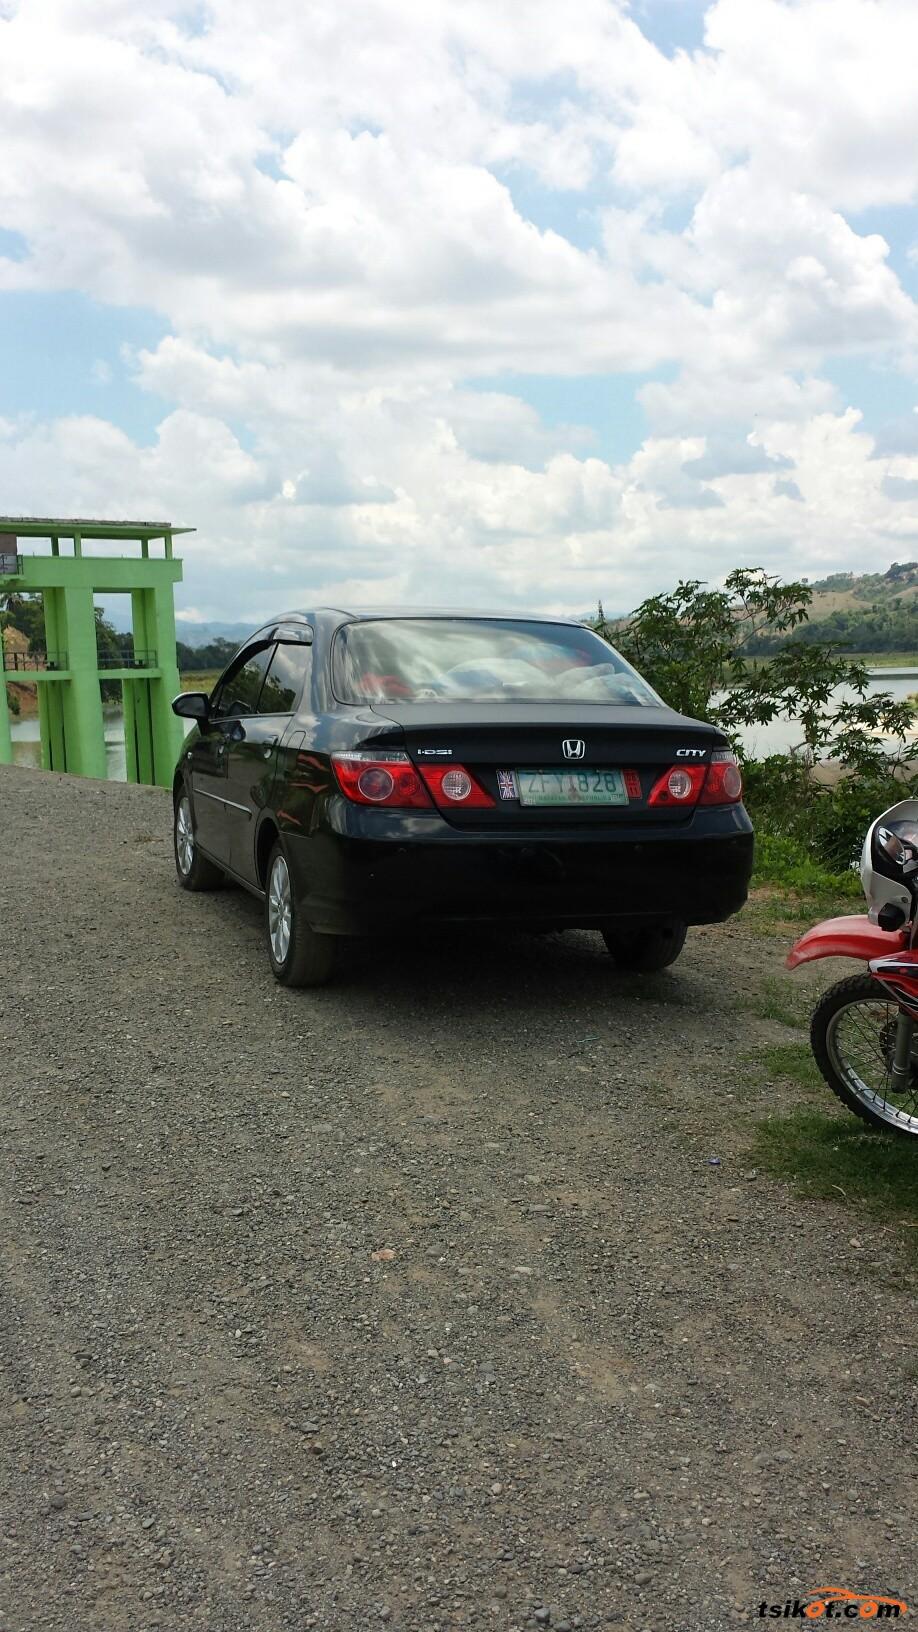 Honda City 2006 - 6